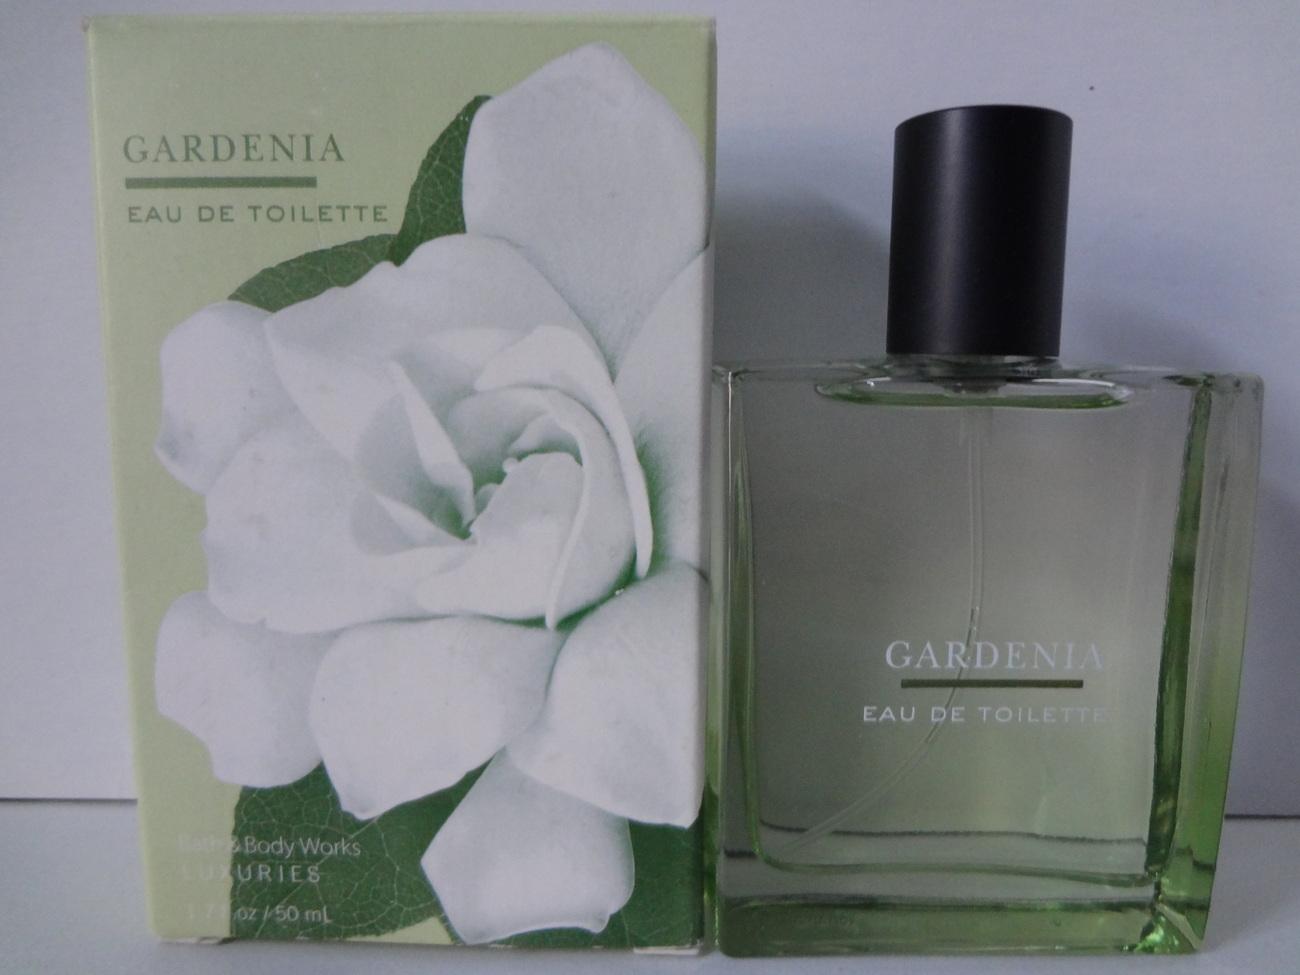 Bath & Body Works Luxuries Gardenia Eau de Toilette 1.7 fl oz / 50 ml